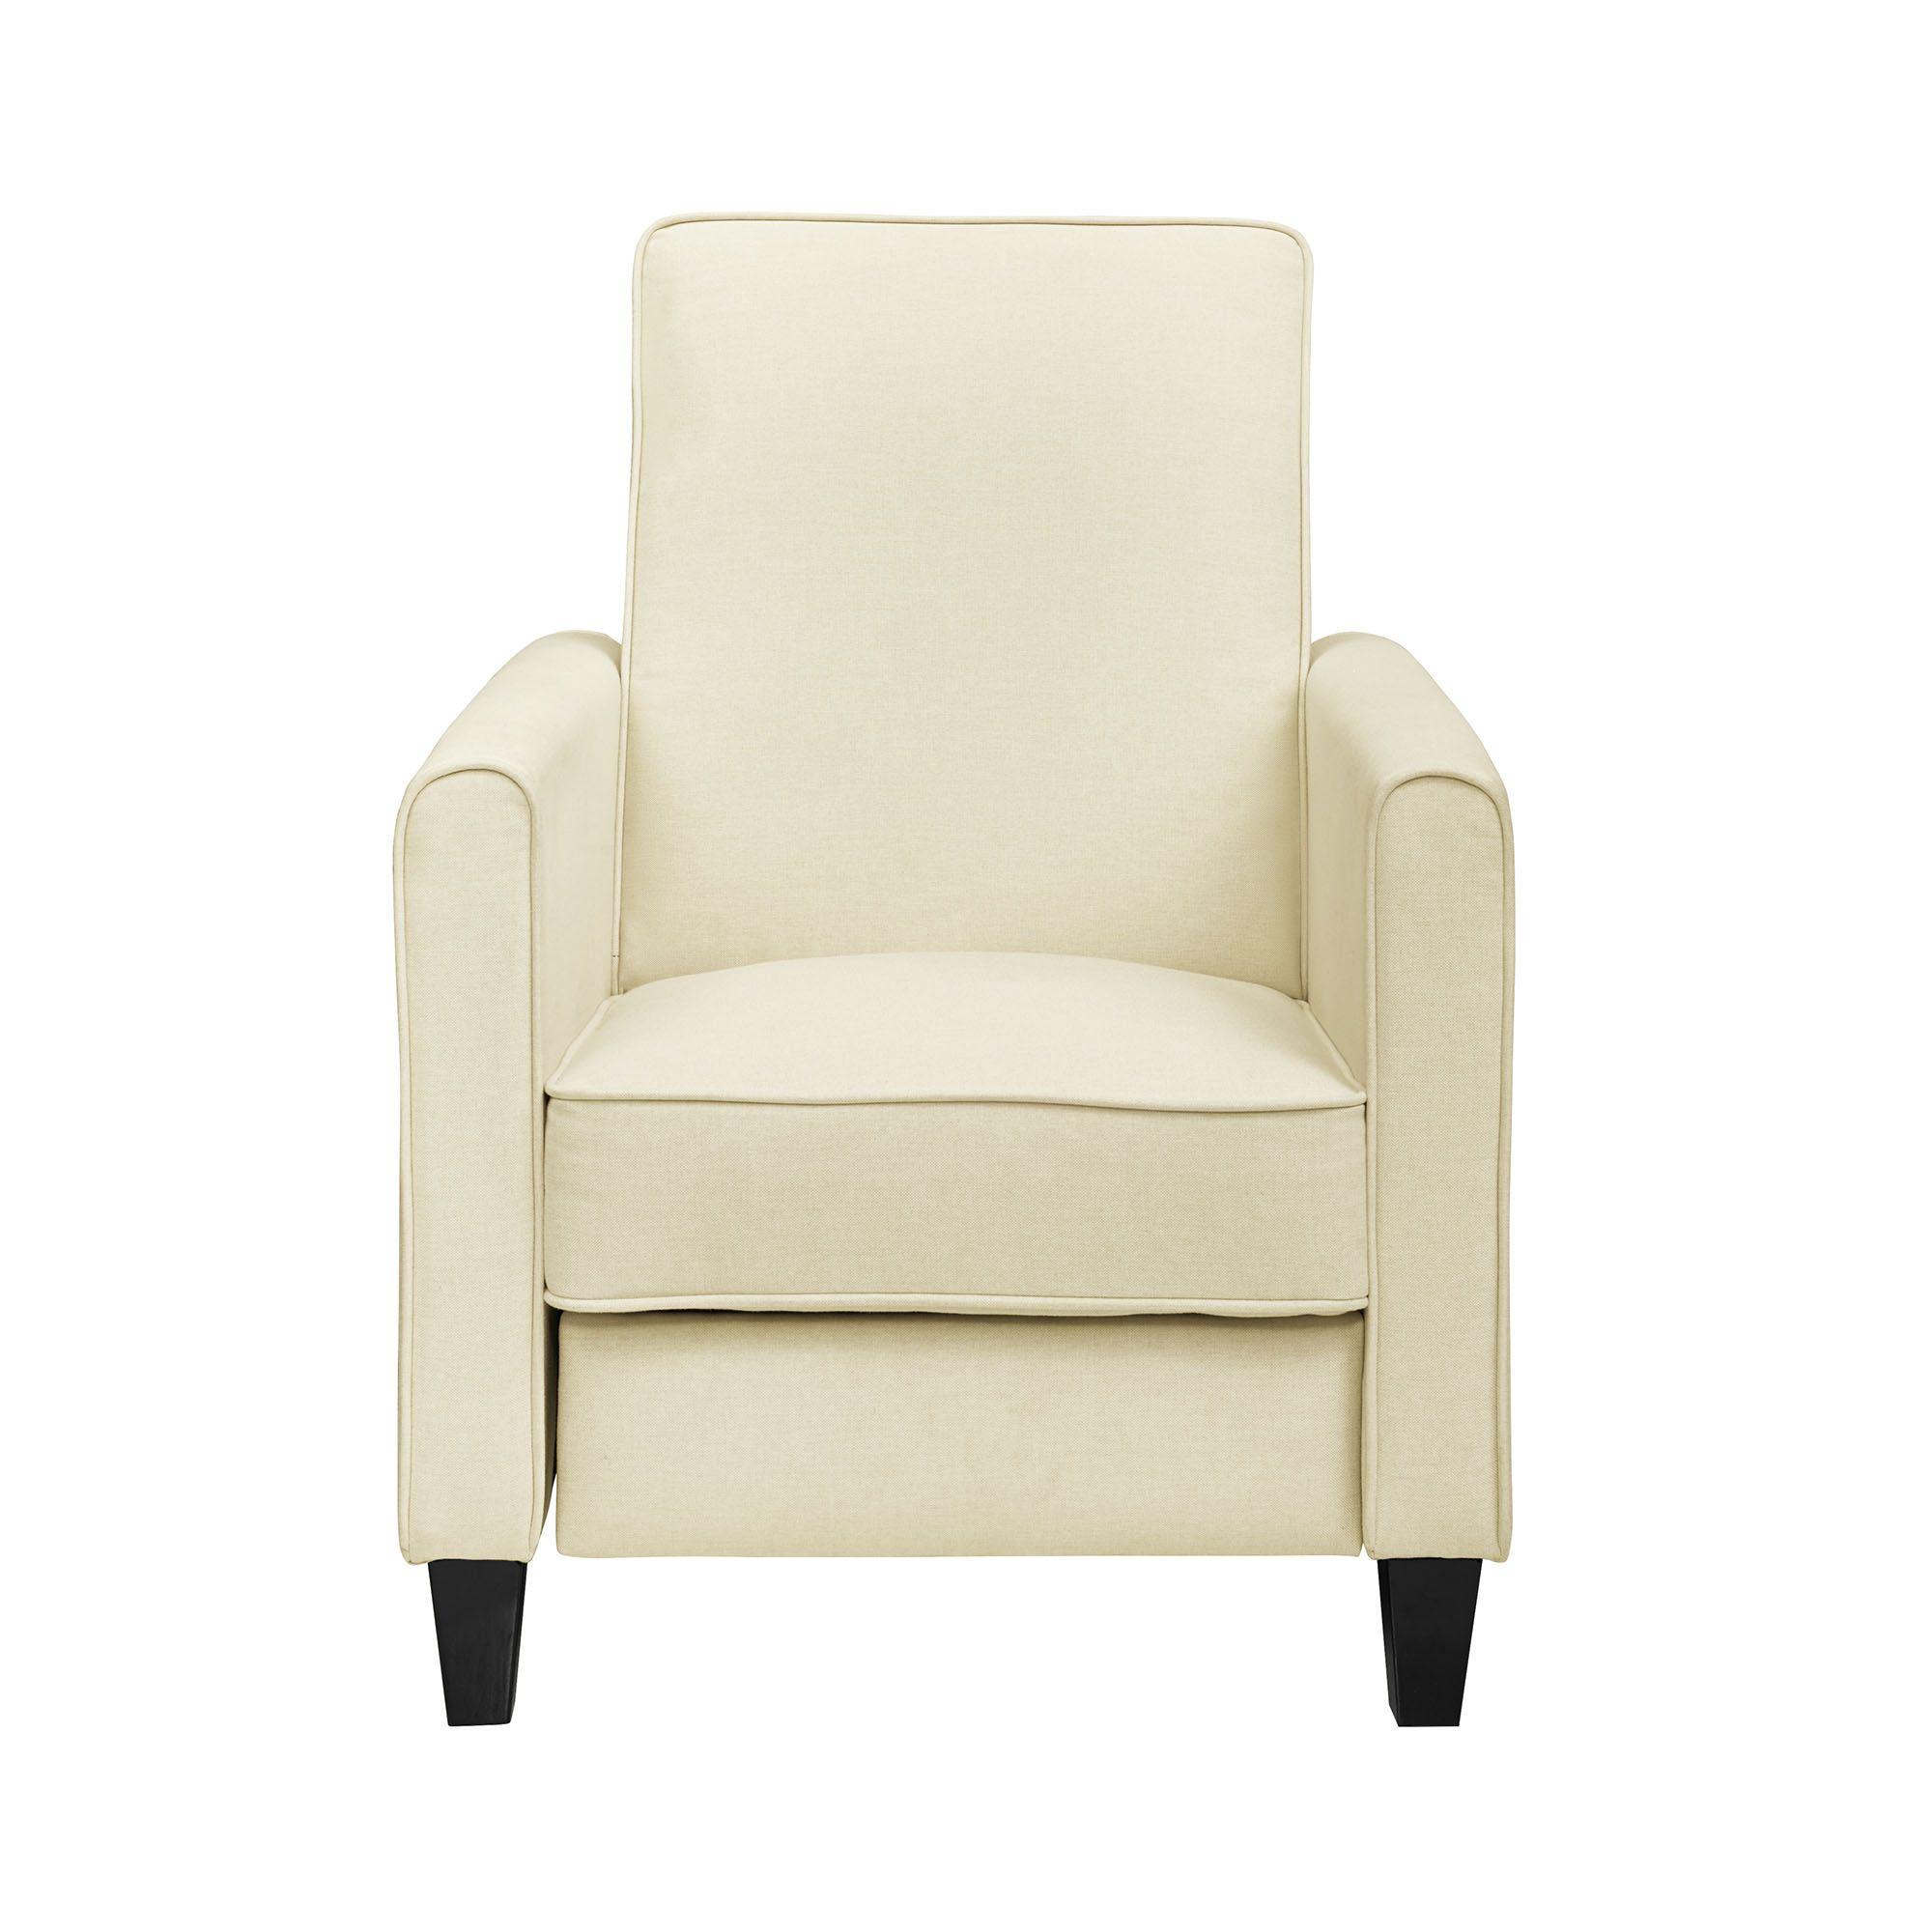 Naomi Home Landon Push Back Recliner Chair [Item # 20316B]